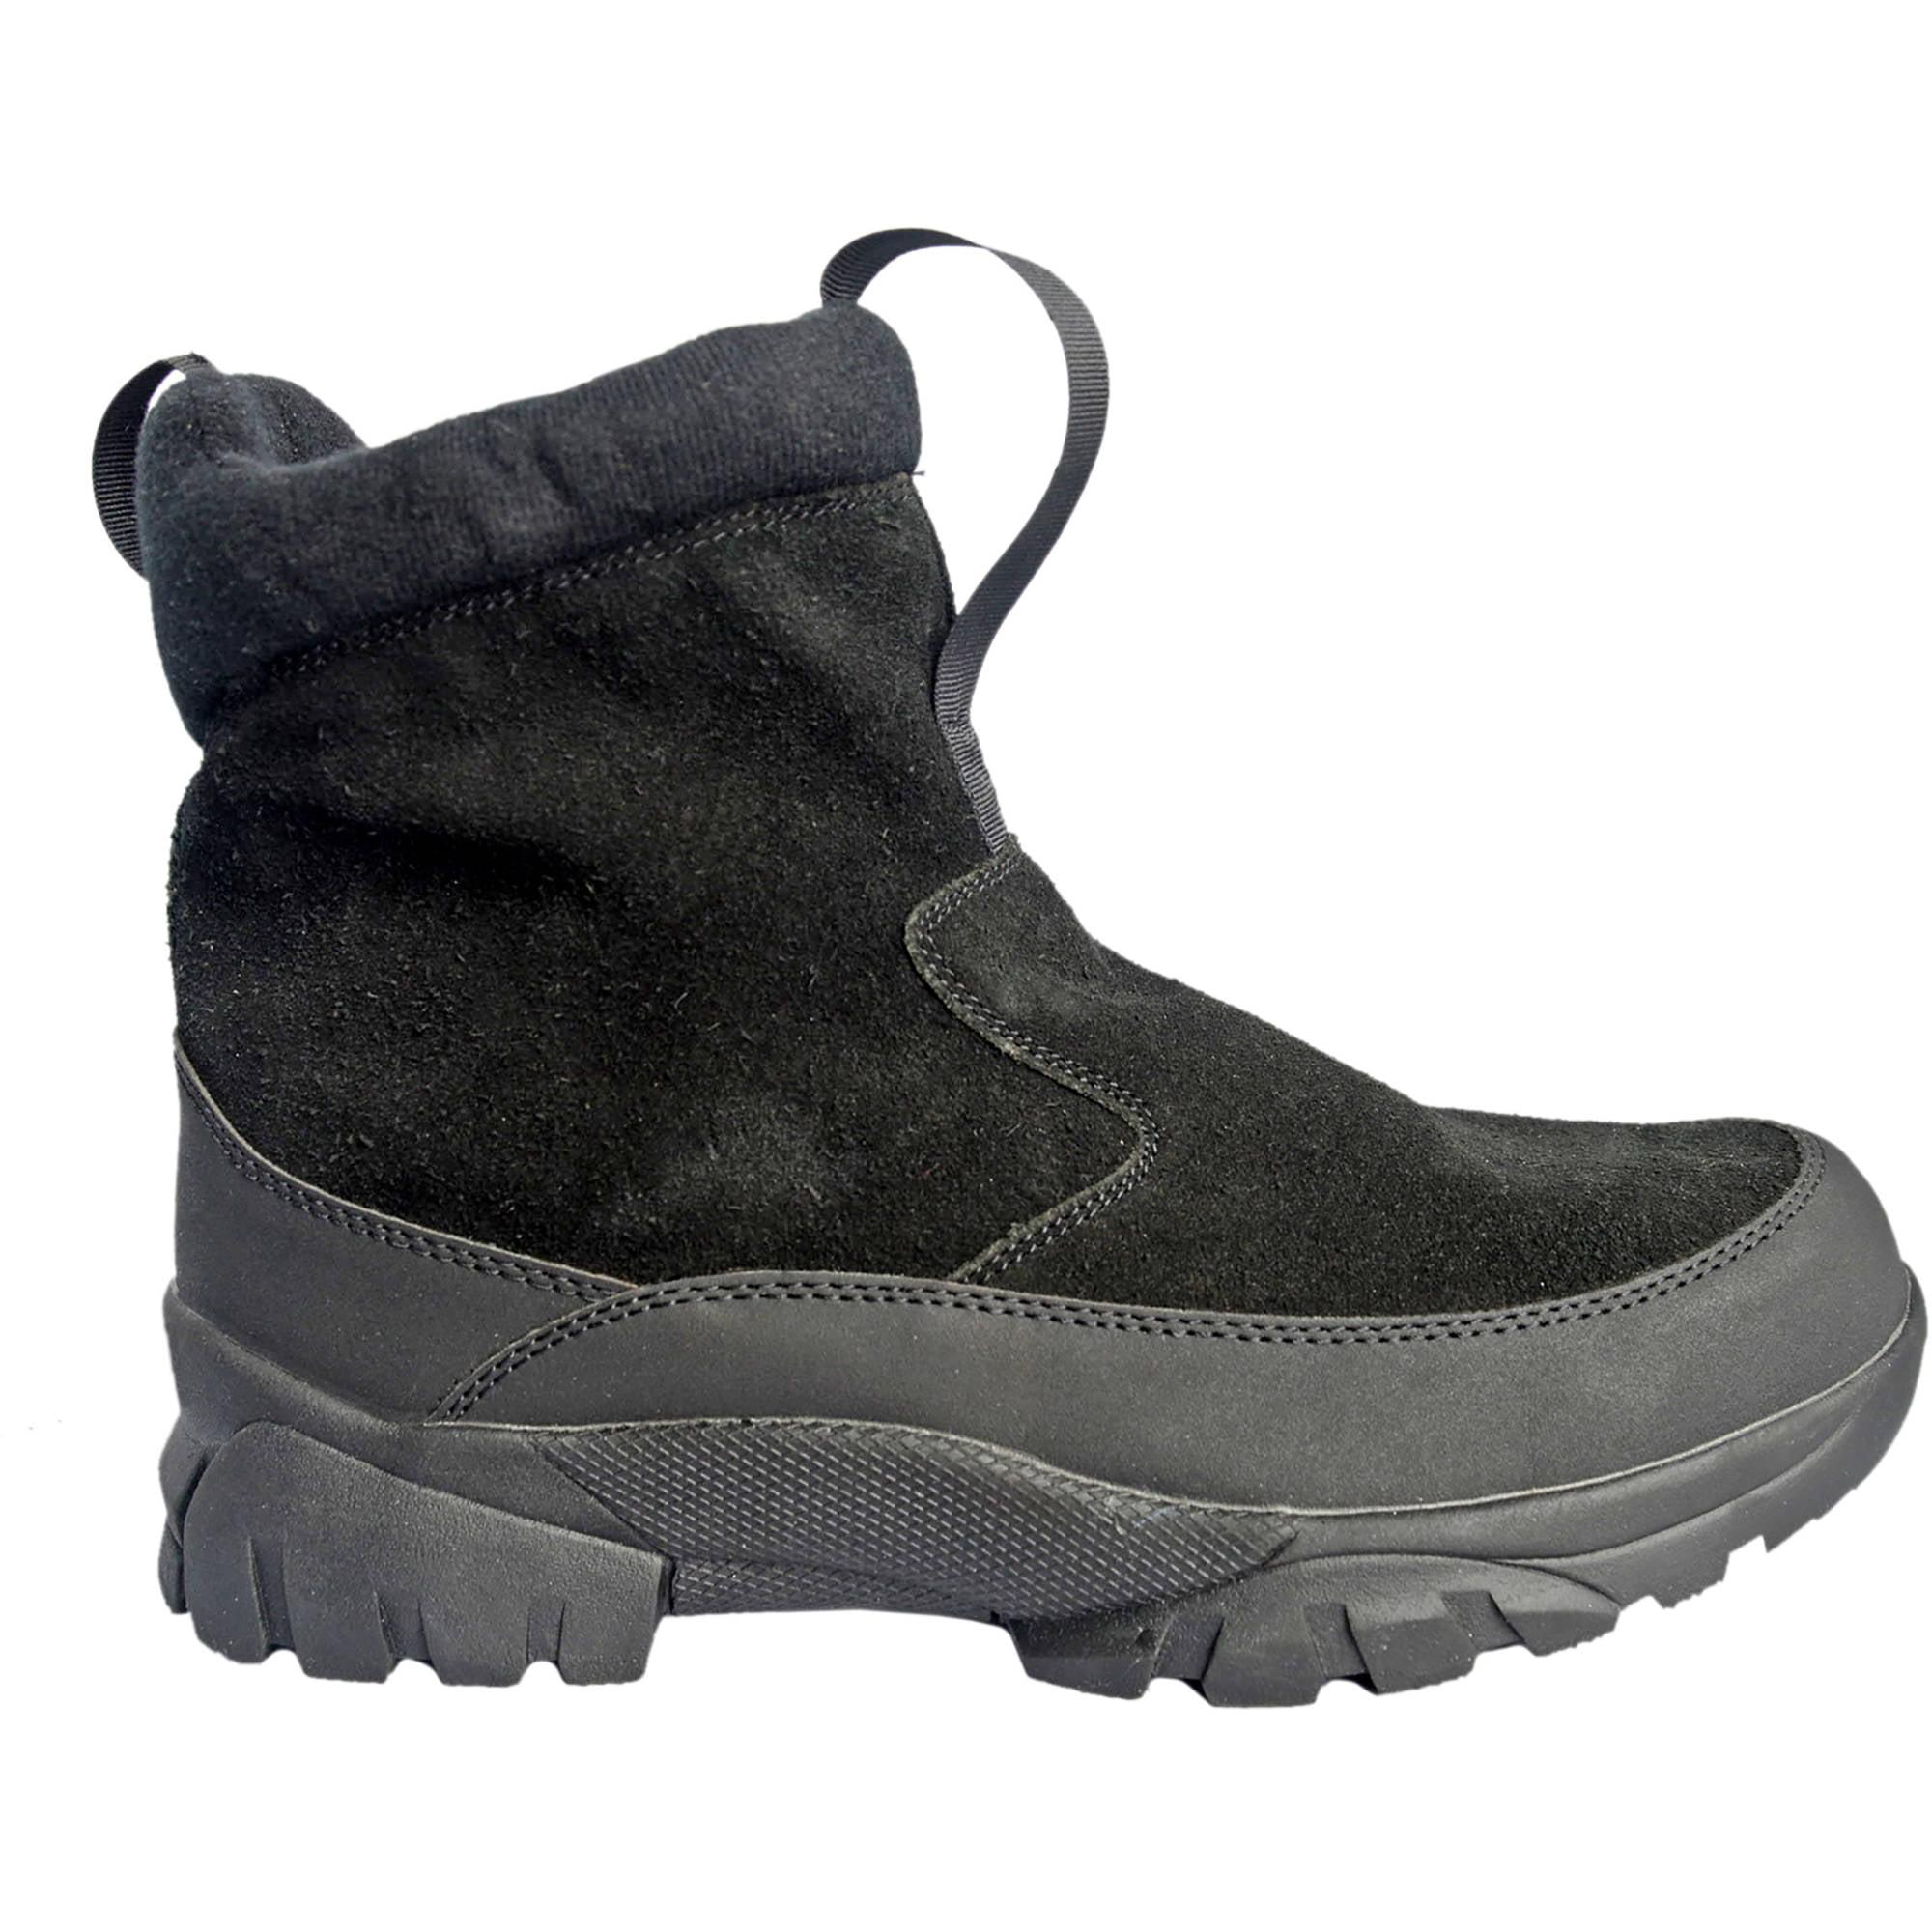 6e98a568757 Ozark Trail - Women s Lace Up Winter Boot - Walmart.com